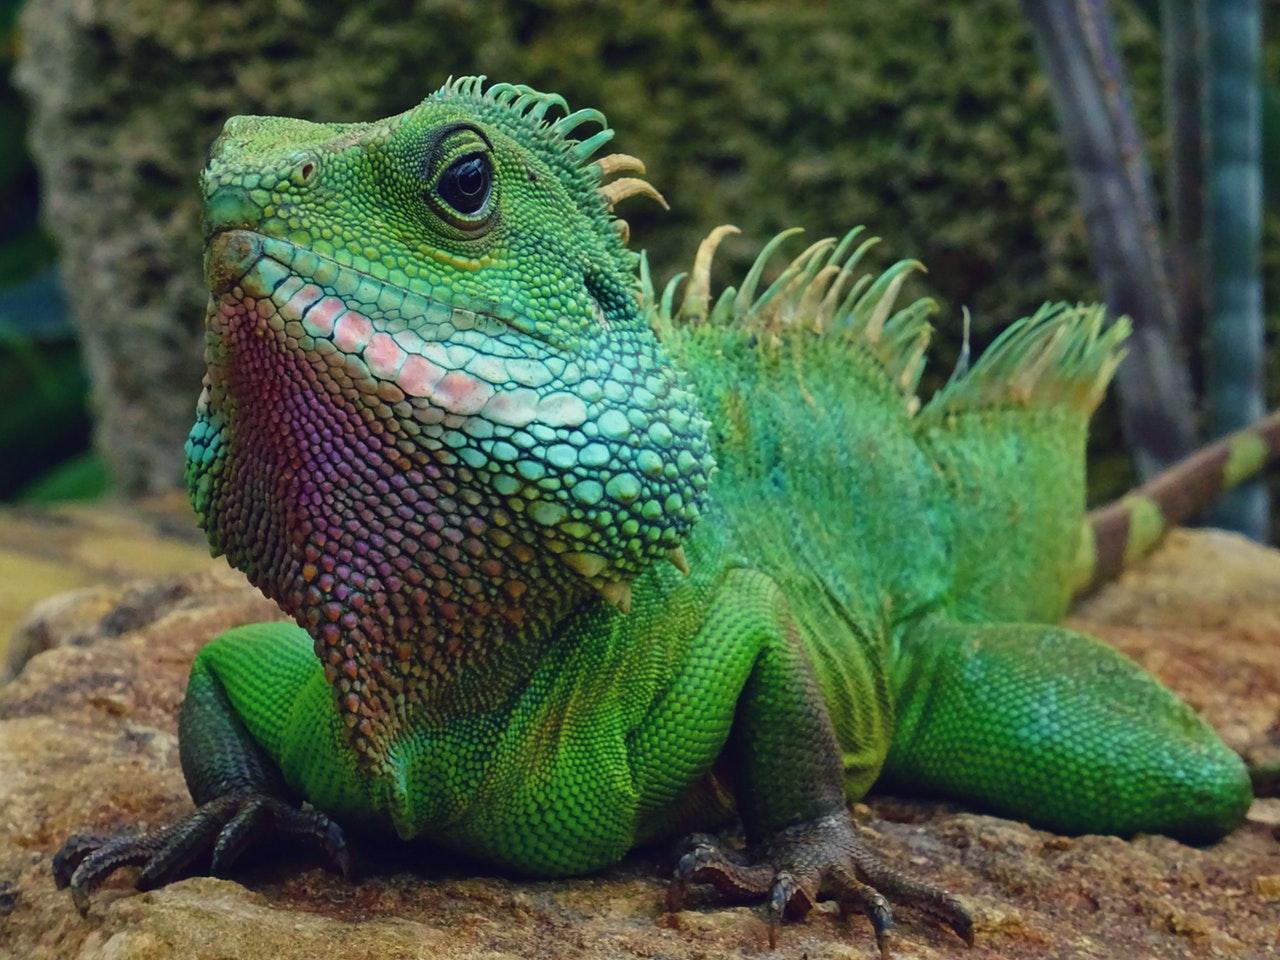 A iguana é um animal herbívoro.